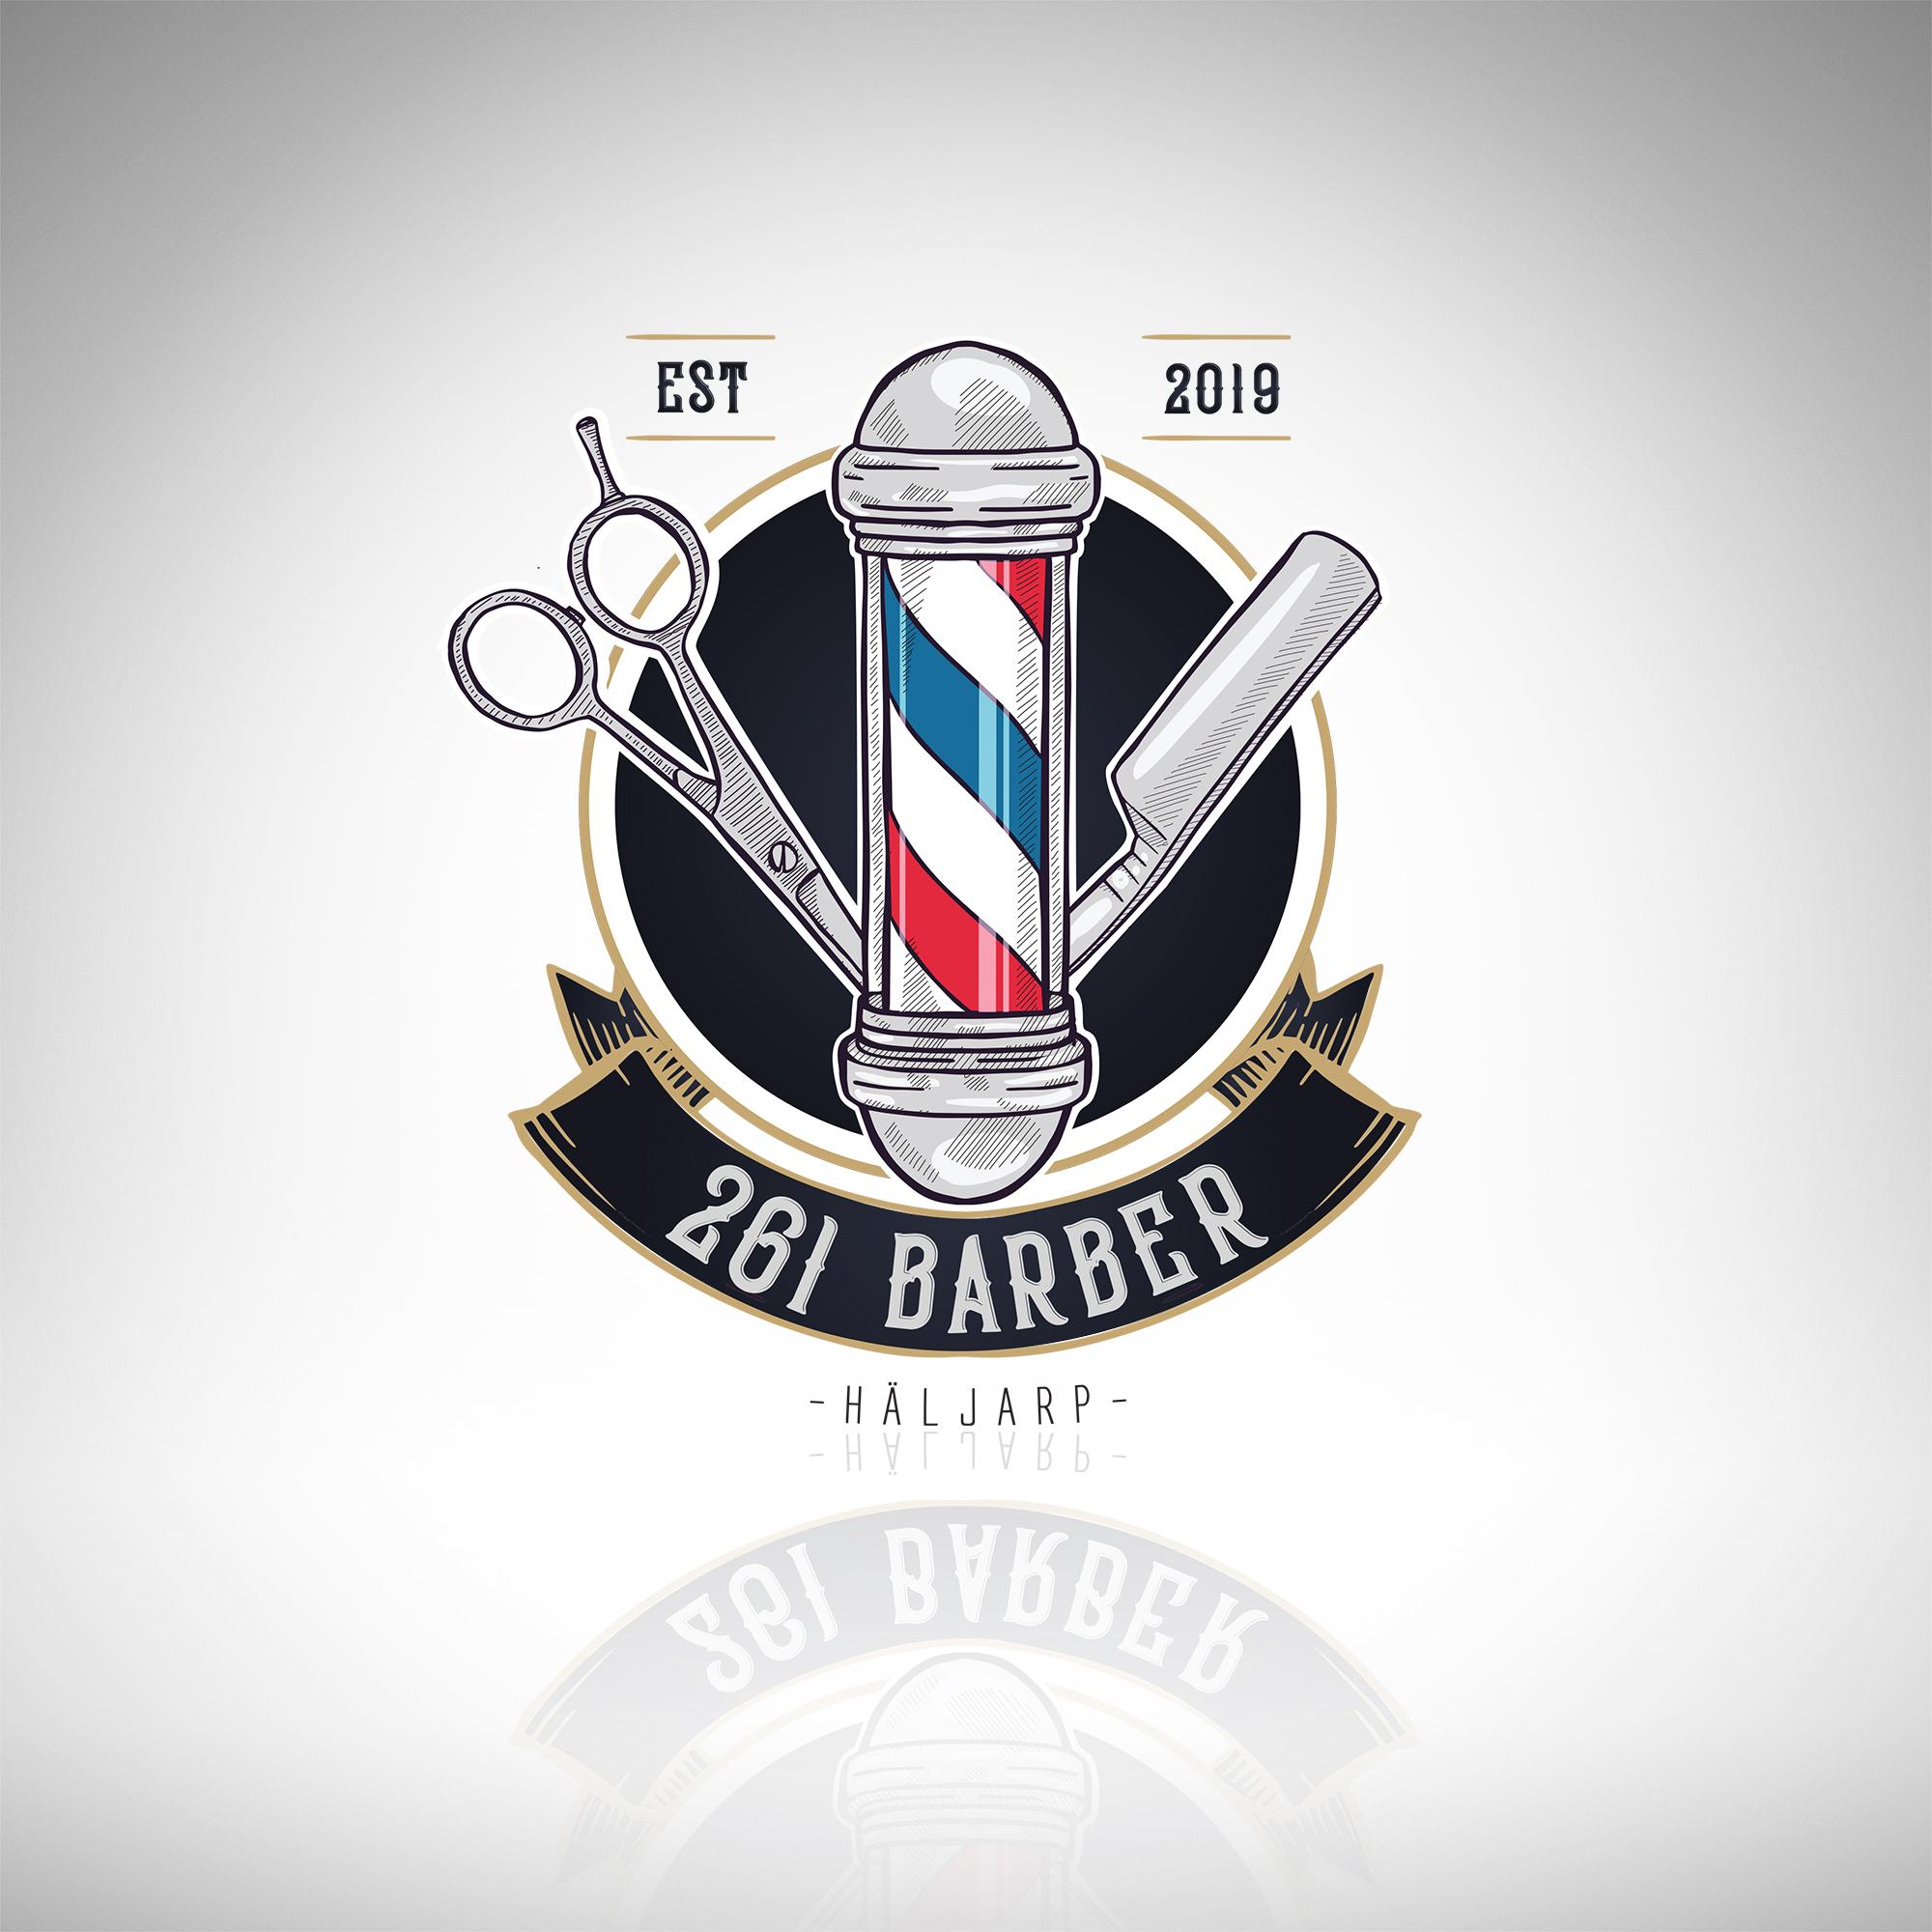 261 Barber